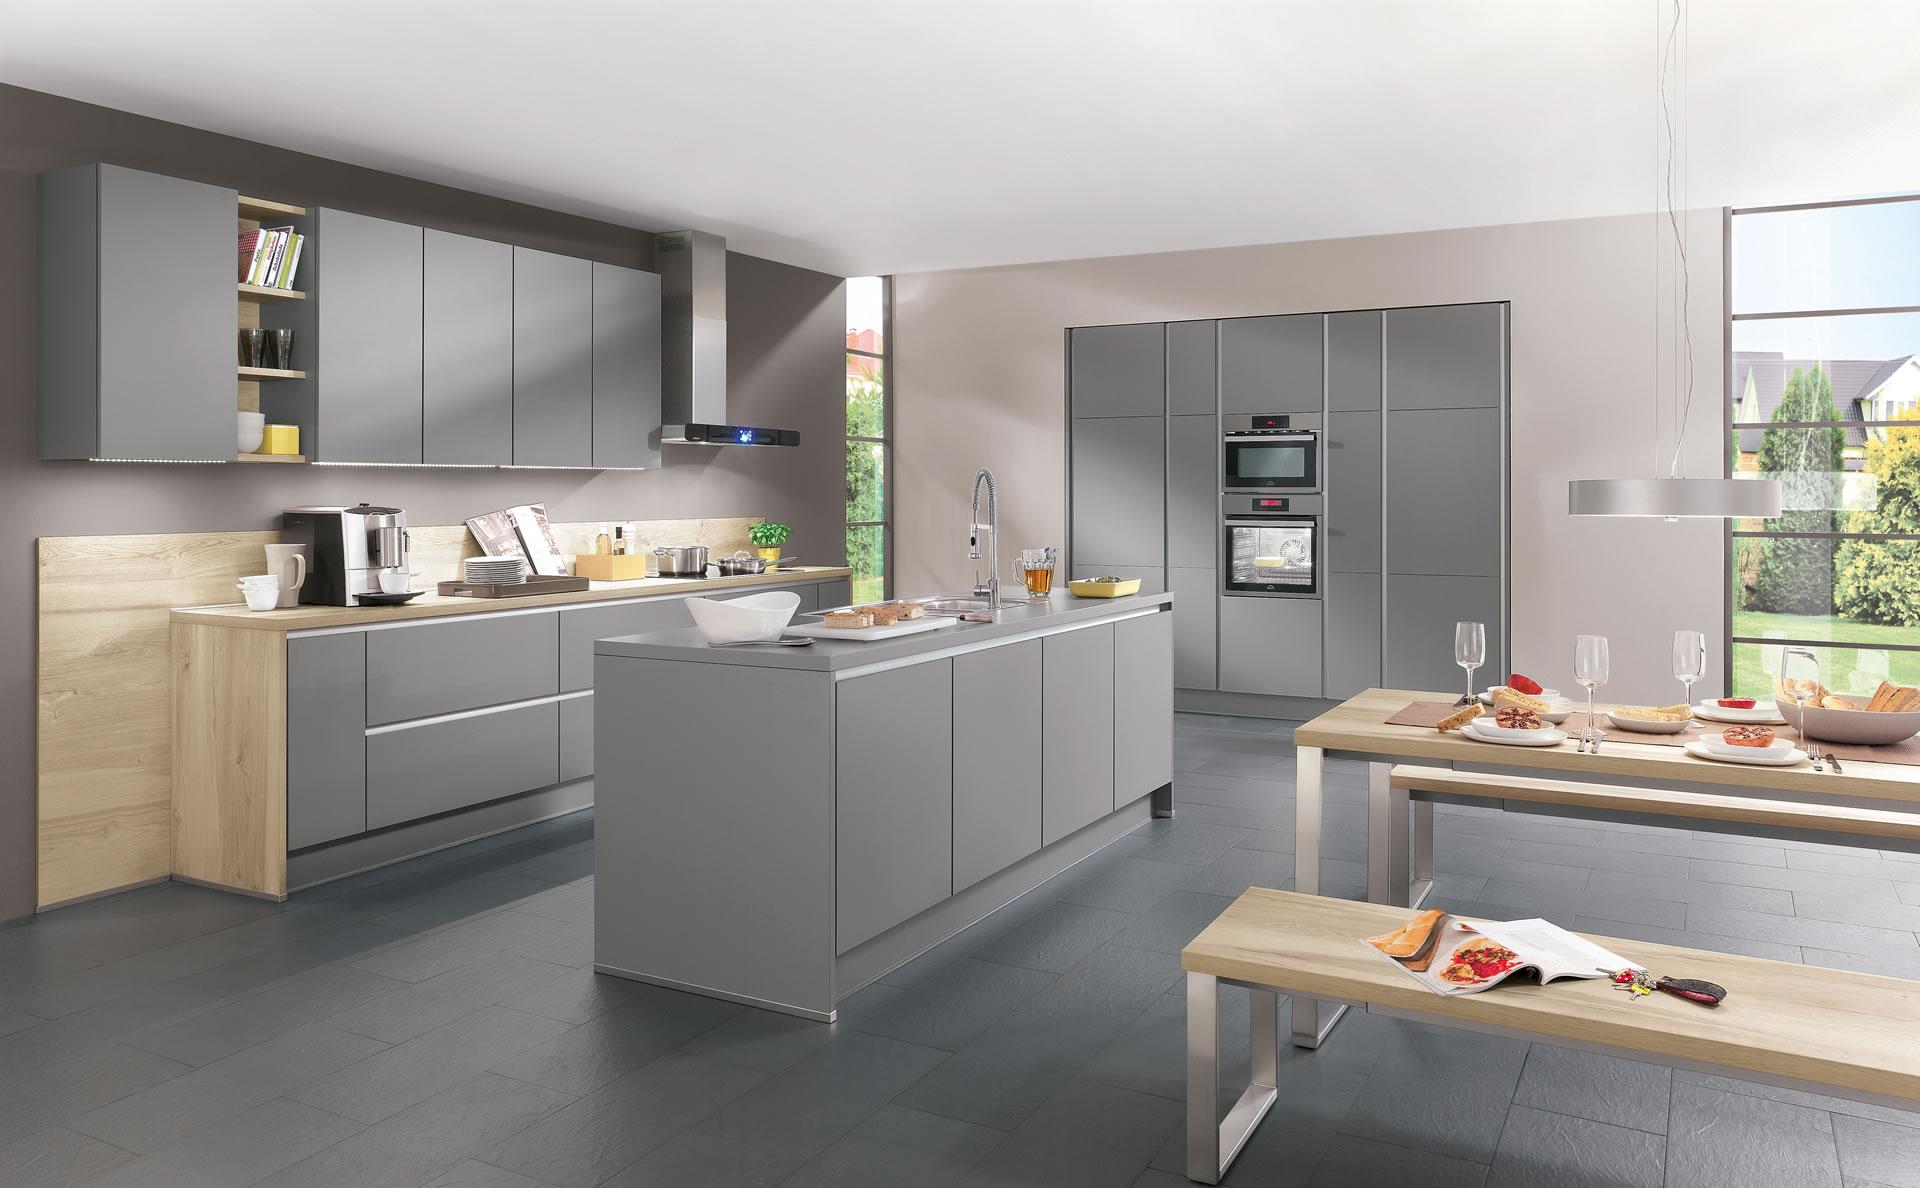 eco cuisine sainte genevi ve des bois 91 essonne. Black Bedroom Furniture Sets. Home Design Ideas